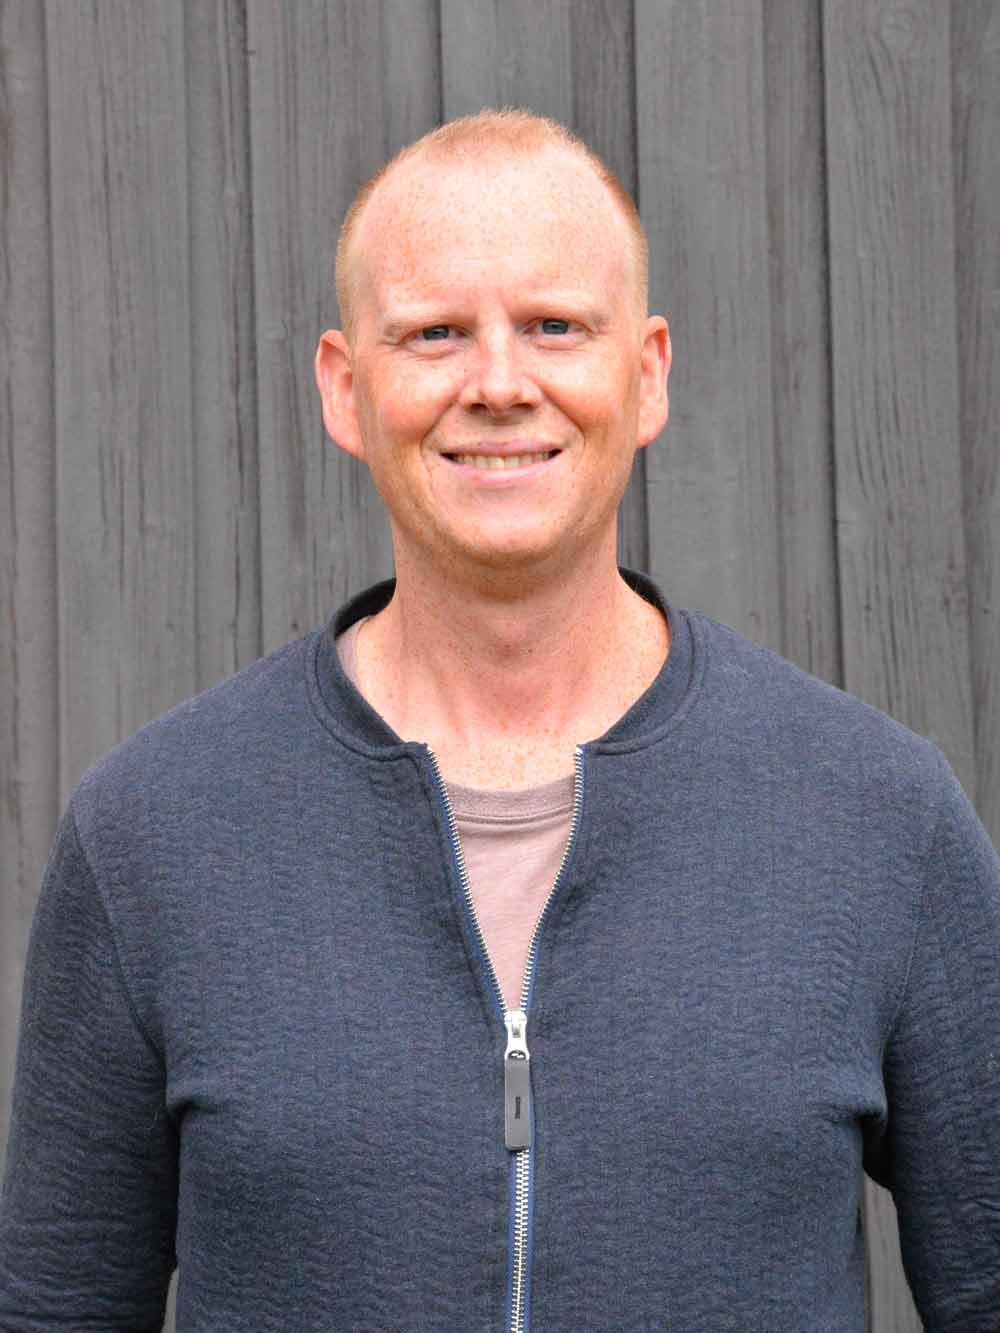 Svein Aksel G. Nakkestad